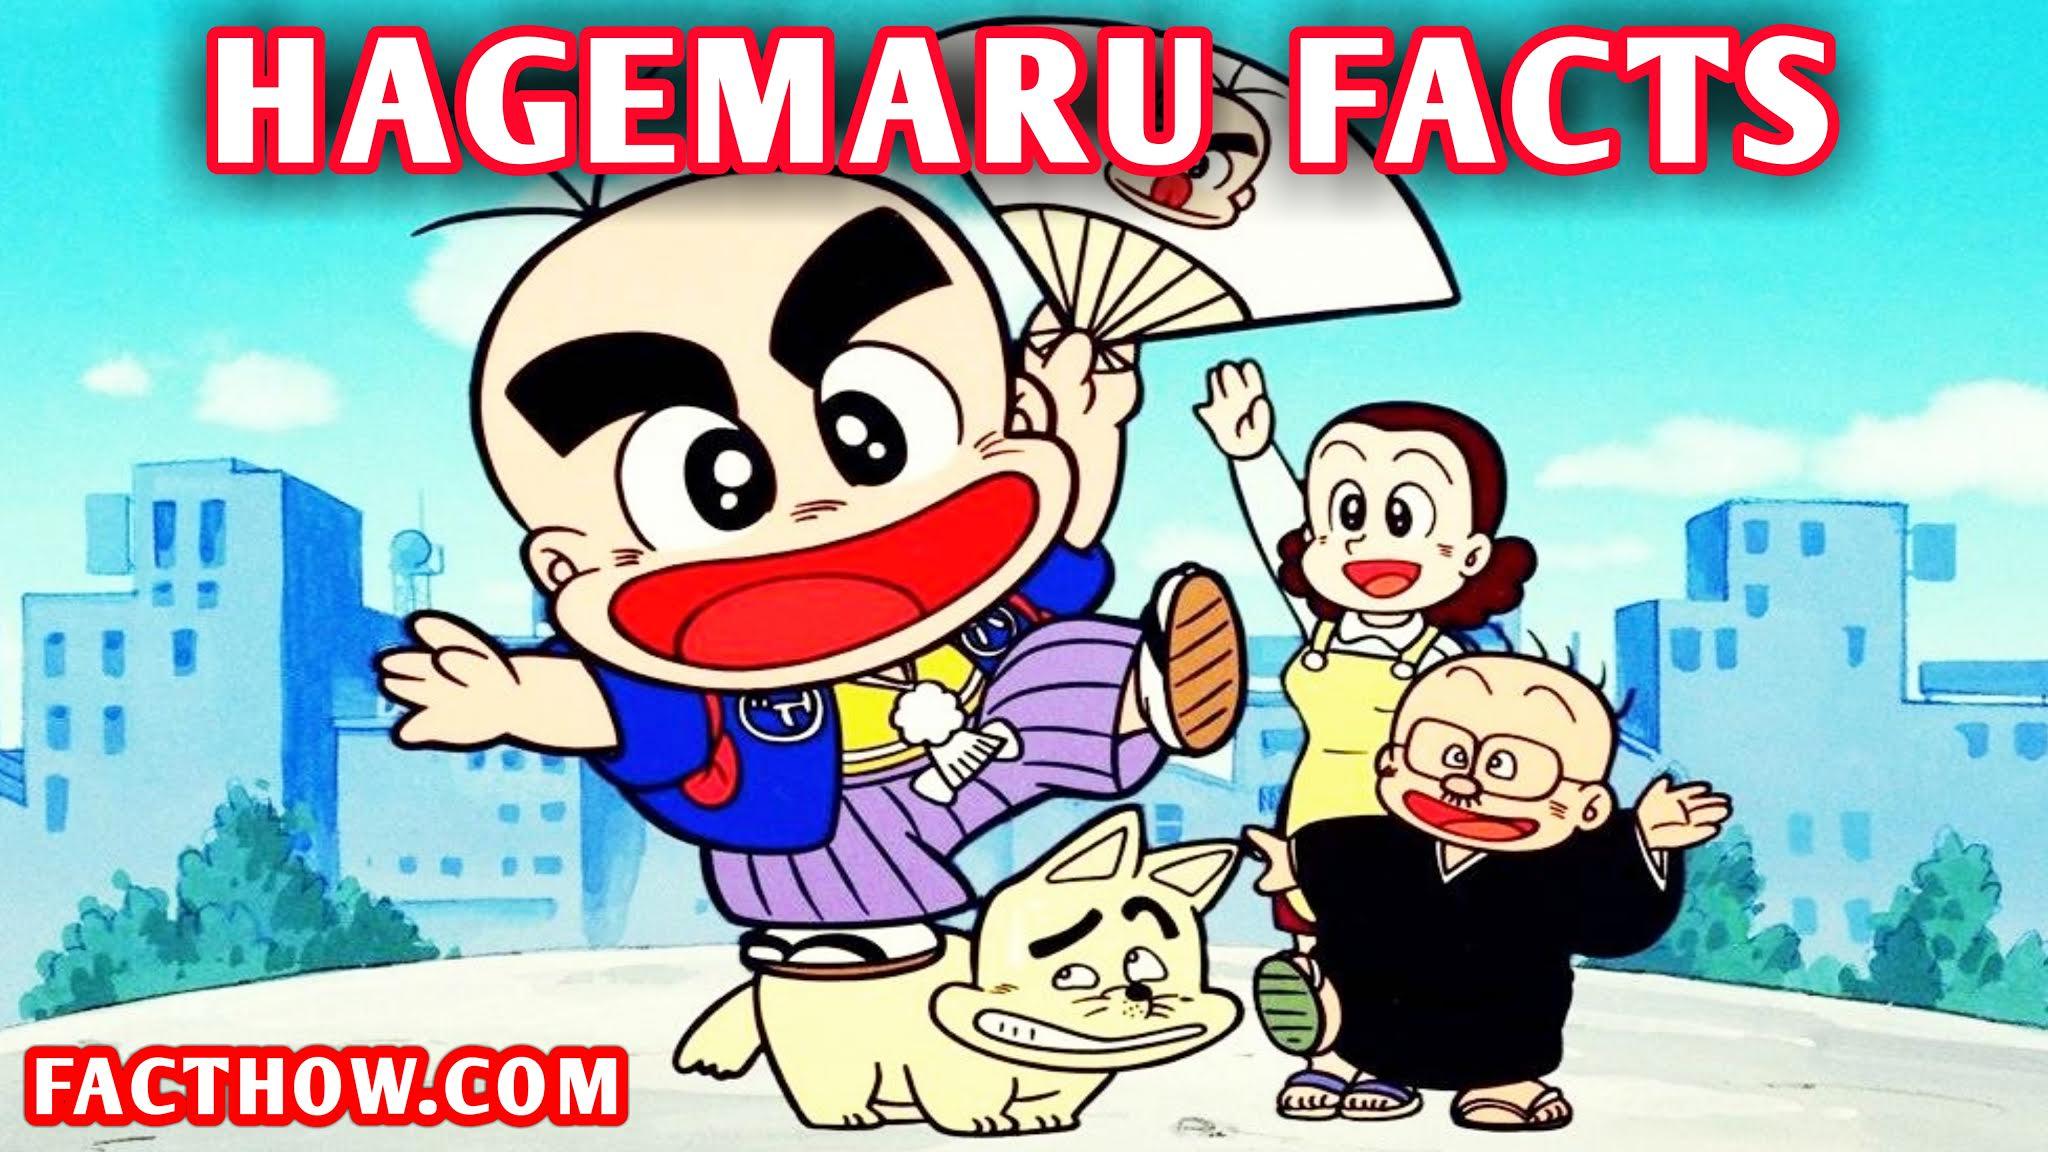 hagemaru-facts-2020-hagemaru-cartoon-hagemaru-game-facts-interesting-amazing-tsurupika-hagemaru-59-episodes-hagemaru-rochak-tathya-hindi-facthow-fact-how